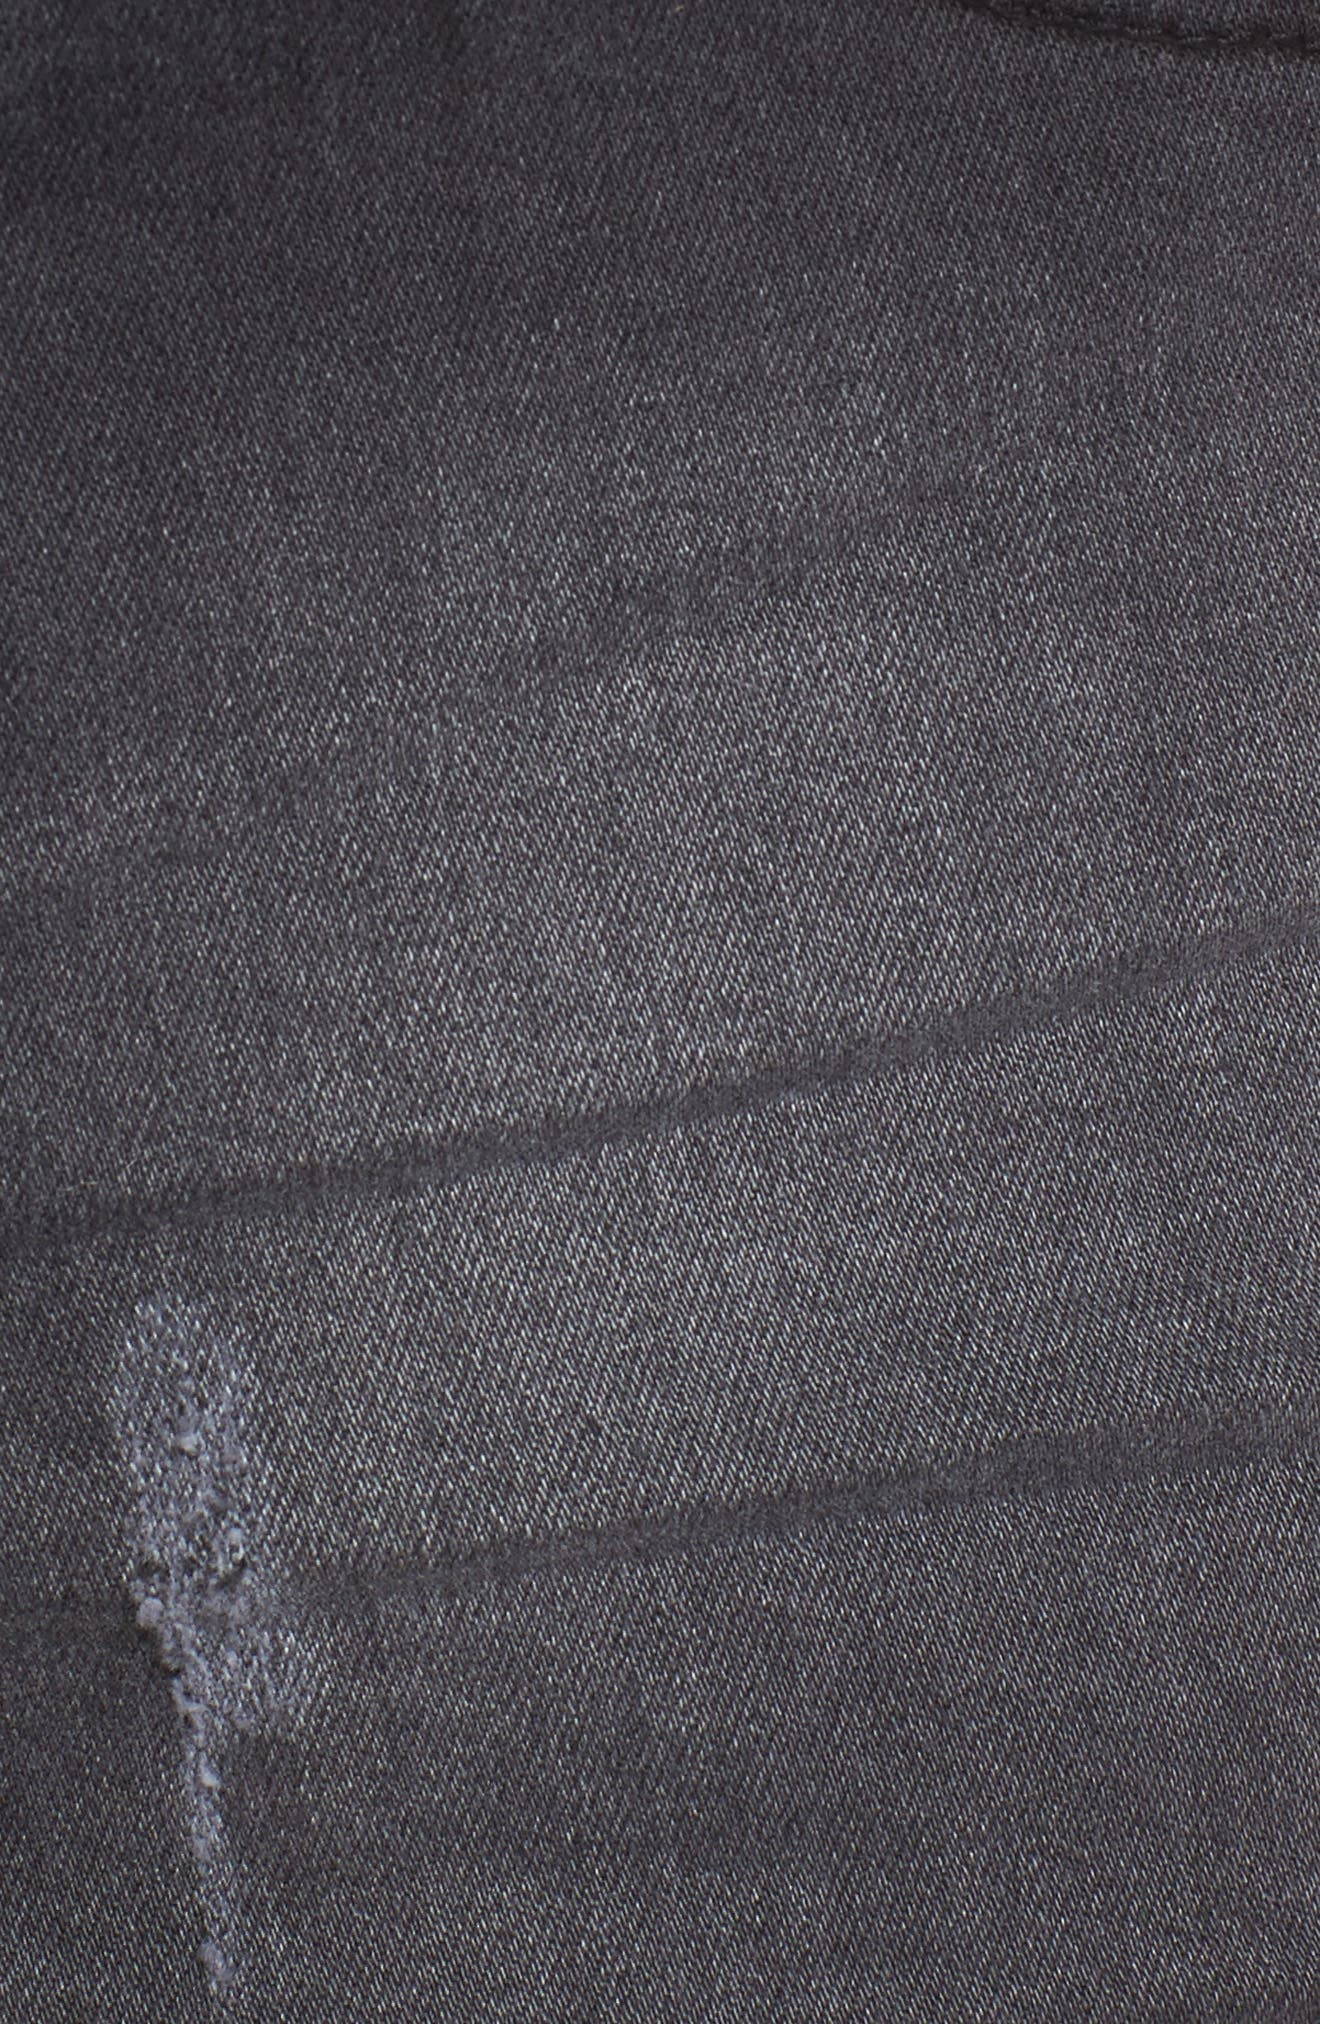 Rachel High Waisted Denim Shorts,                             Alternate thumbnail 5, color,                             001